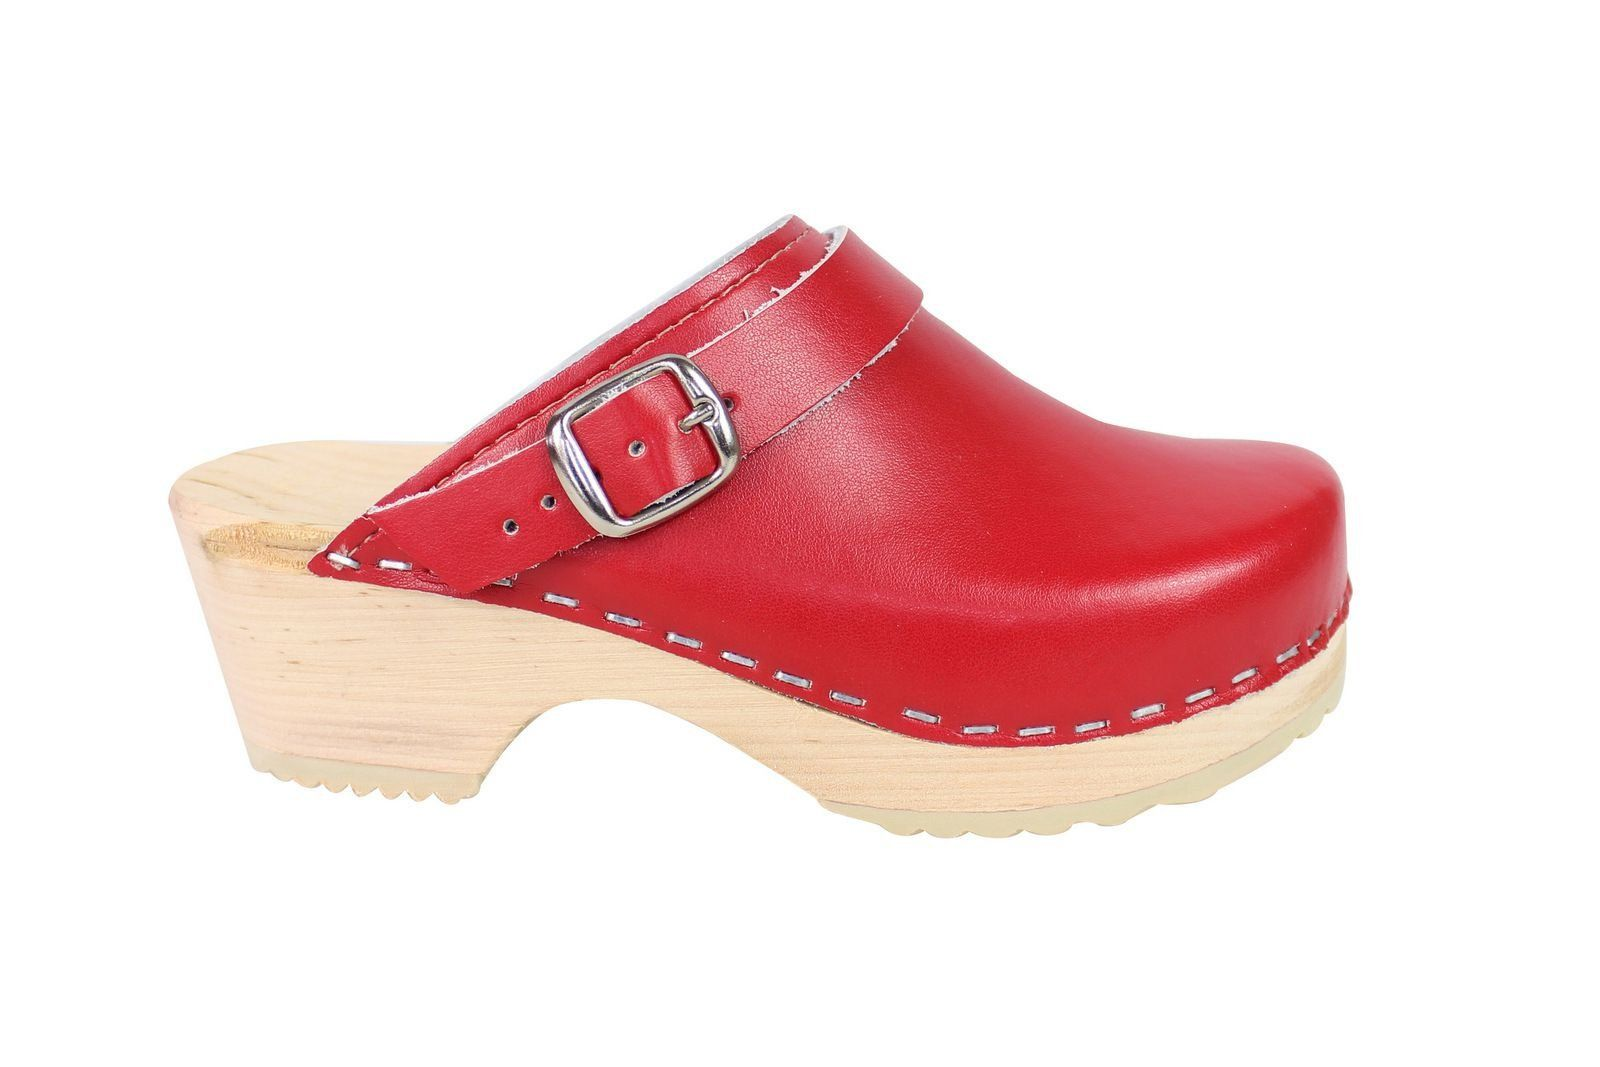 Little Lotta's Kids Classic Clogs in Red Side